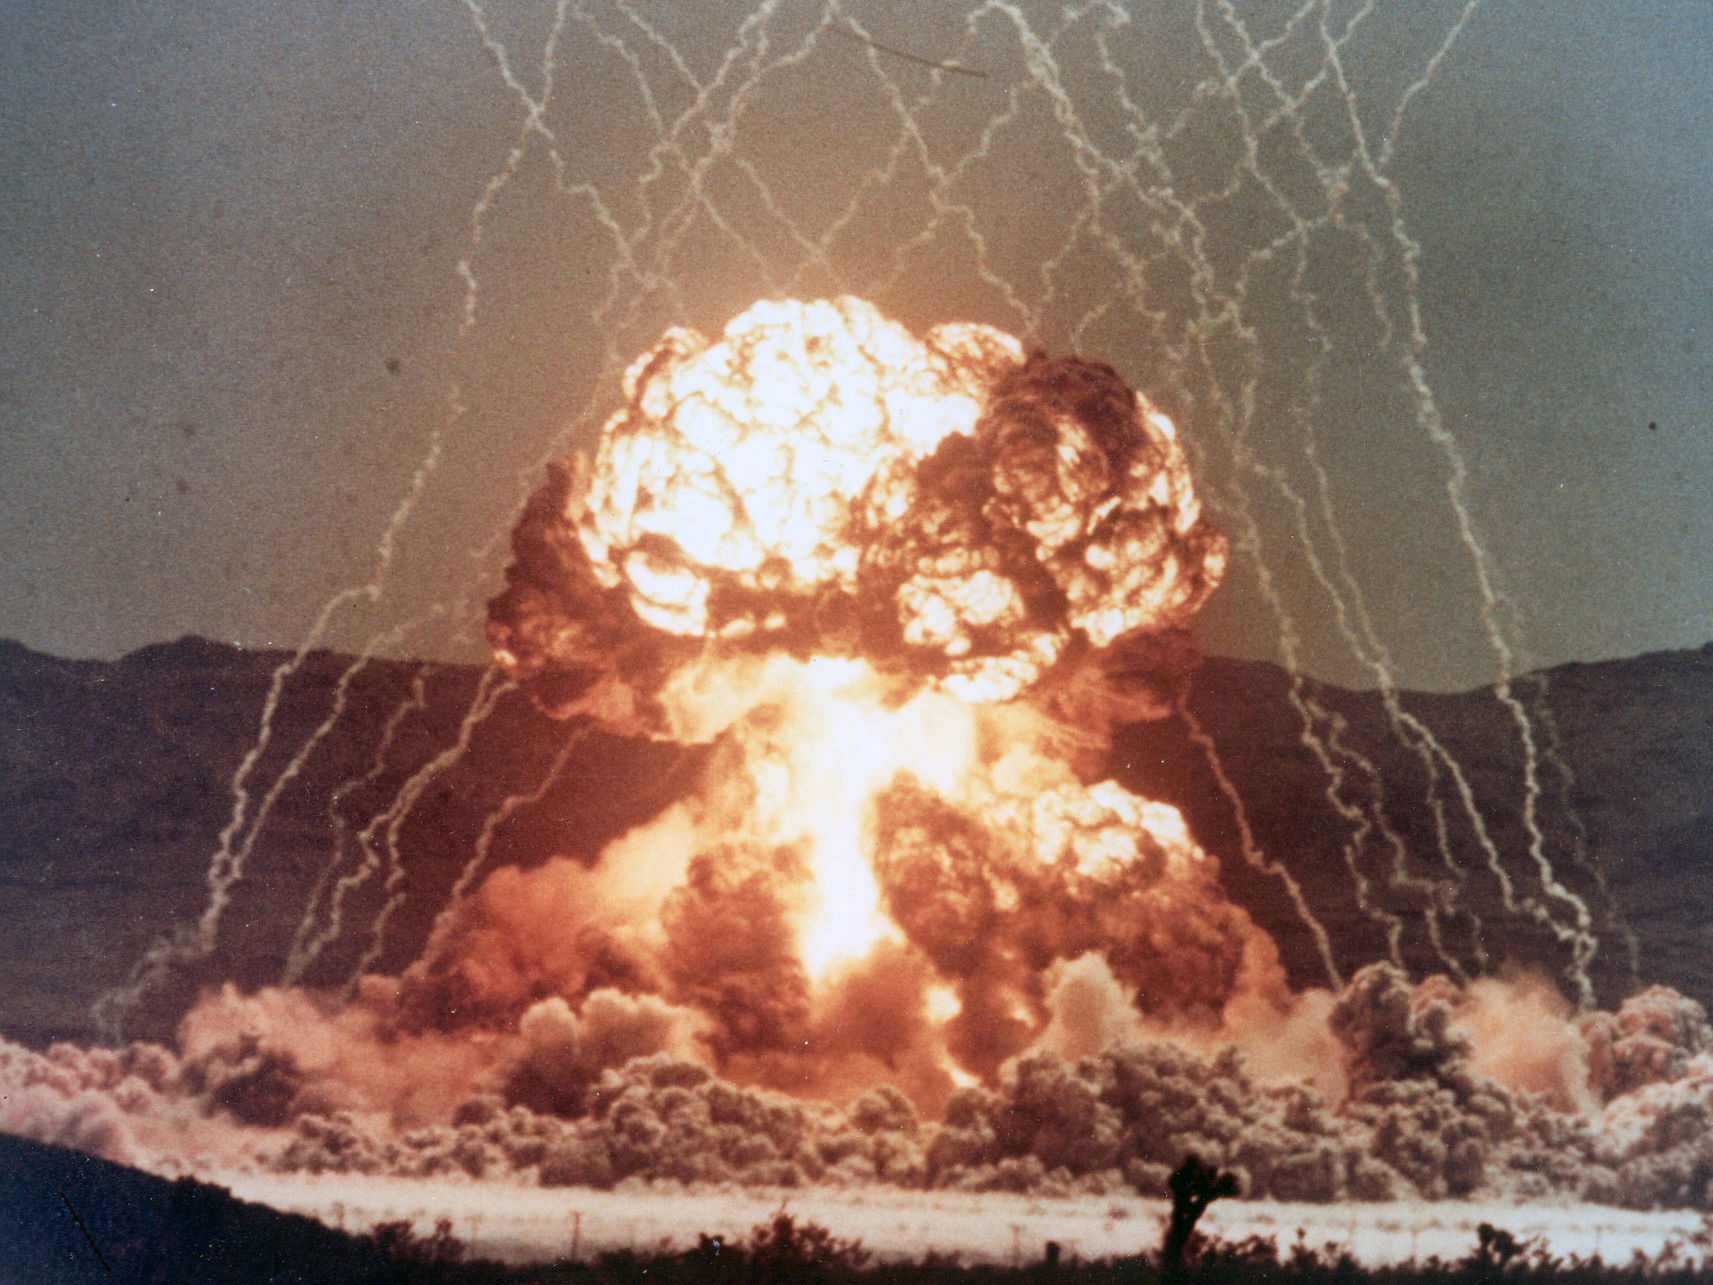 Nuclear bomb 1